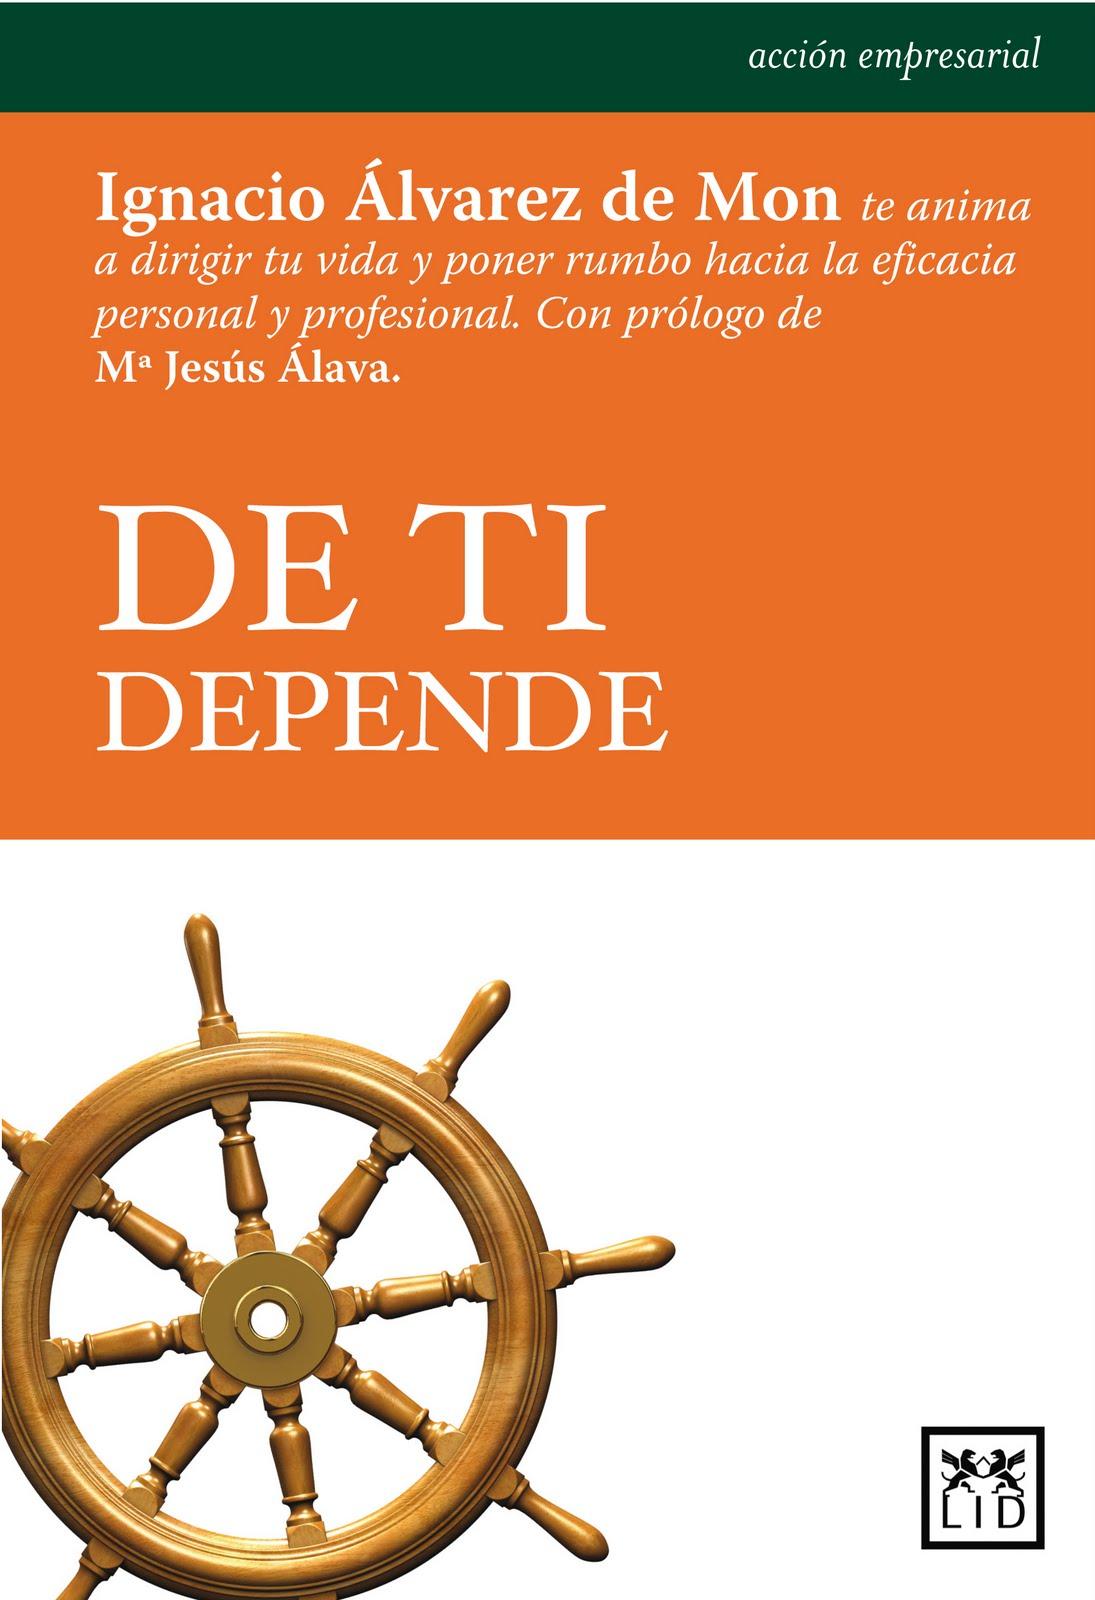 De ti depende, Juan Ignacio de Mon